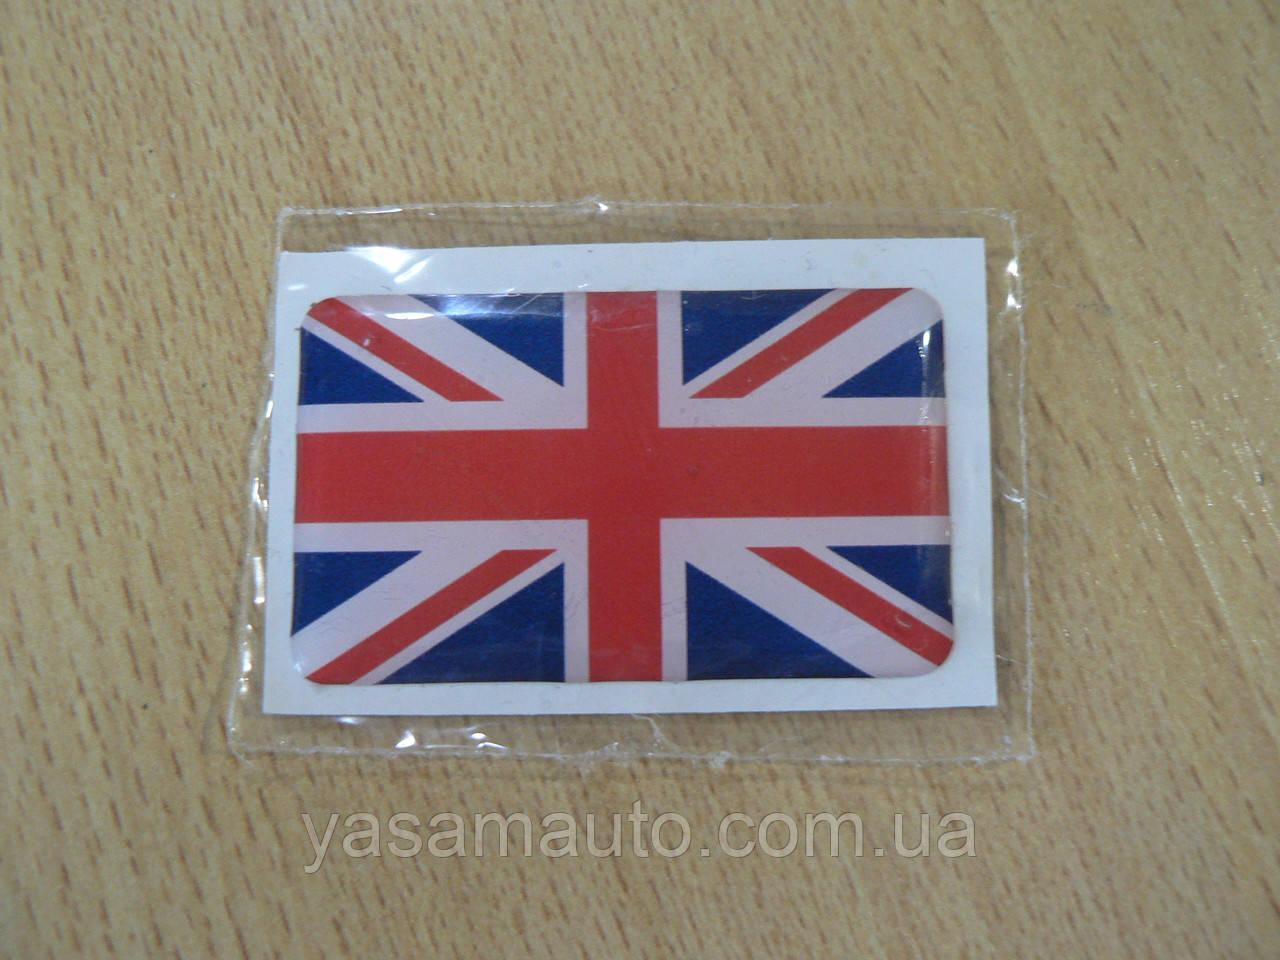 Наклейка s силиконовая флаг 50х30х0,8мм Великобритании Англии в на авто